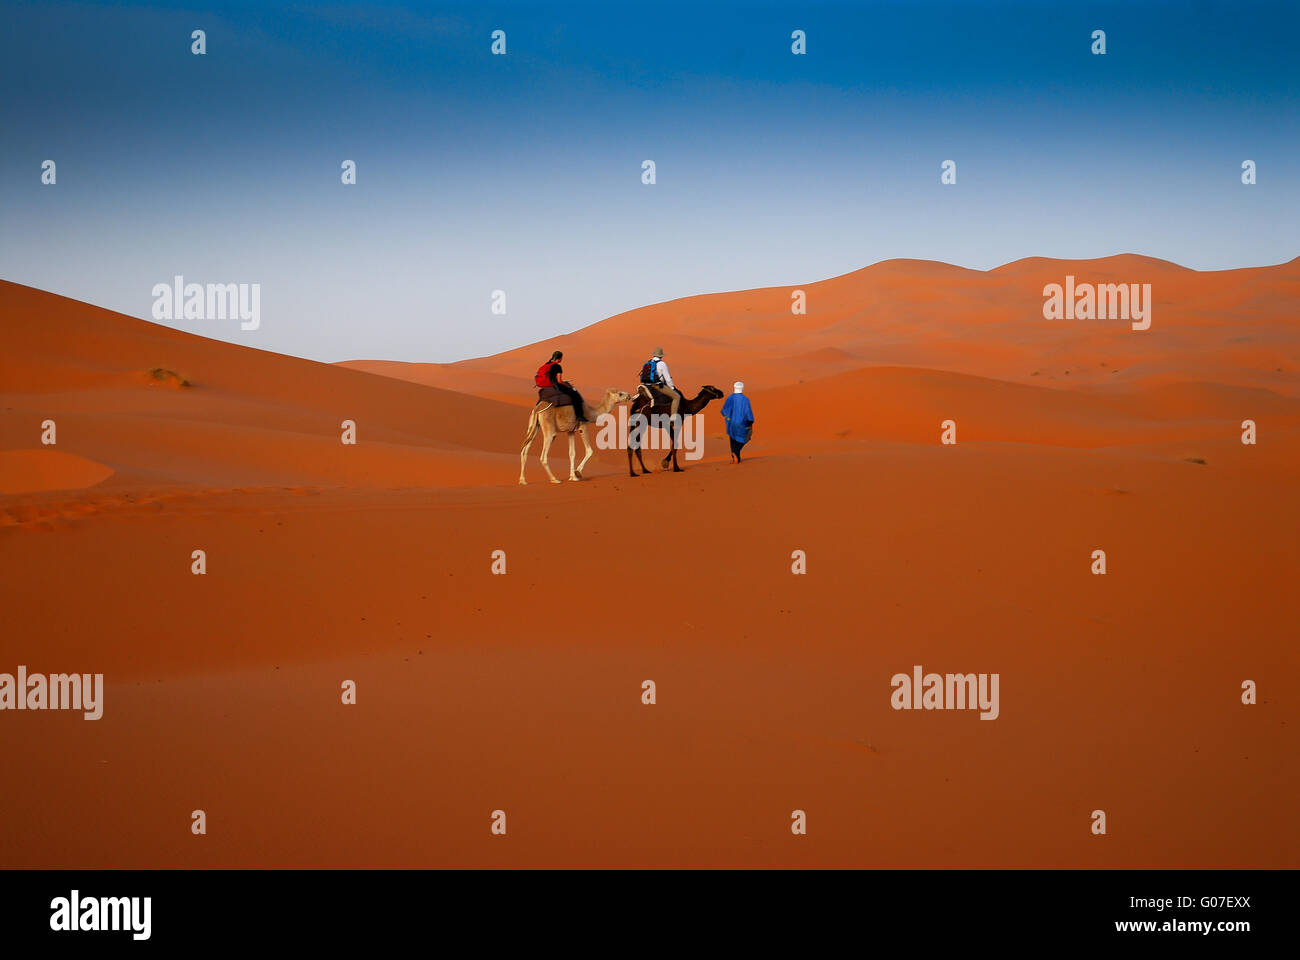 Dunes of Sahara Desert - Stock Image